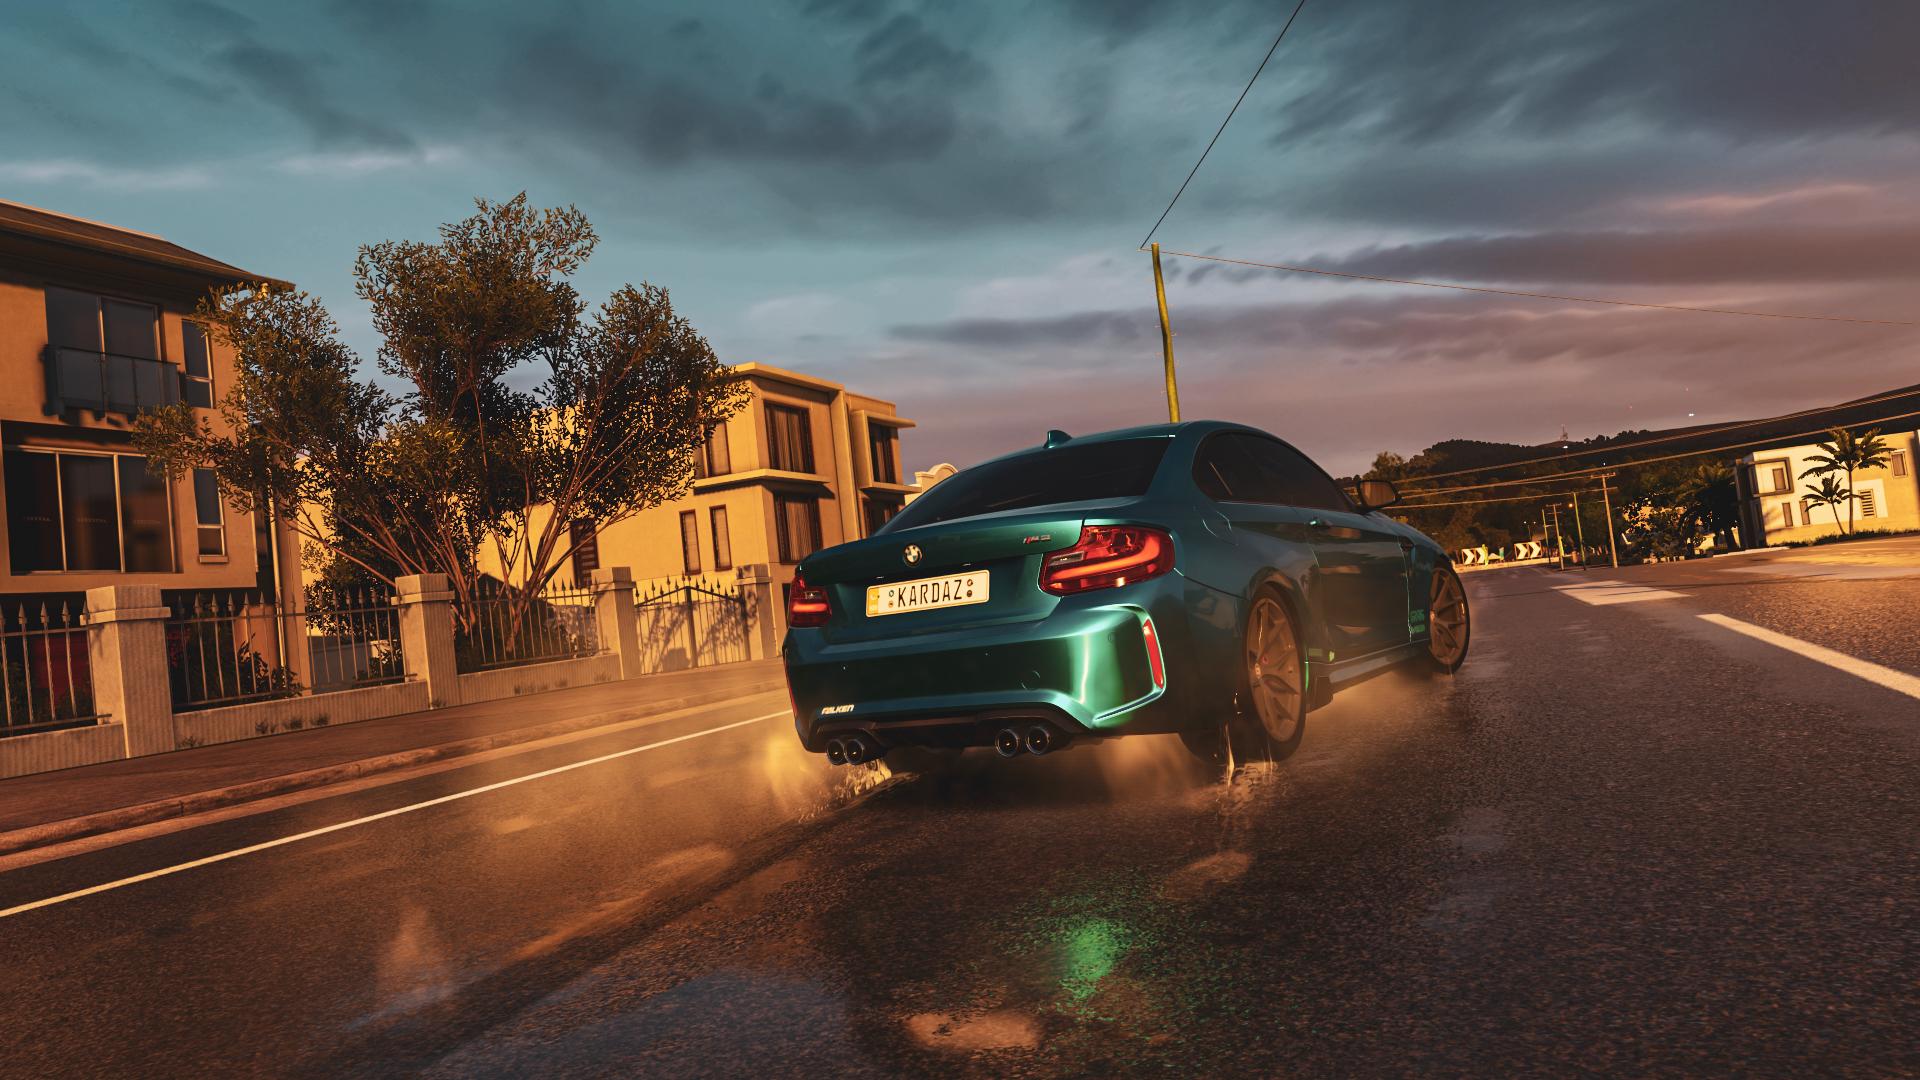 Wallpaper : screen shot, forza horizon 3, Forza Horizon, PC gaming